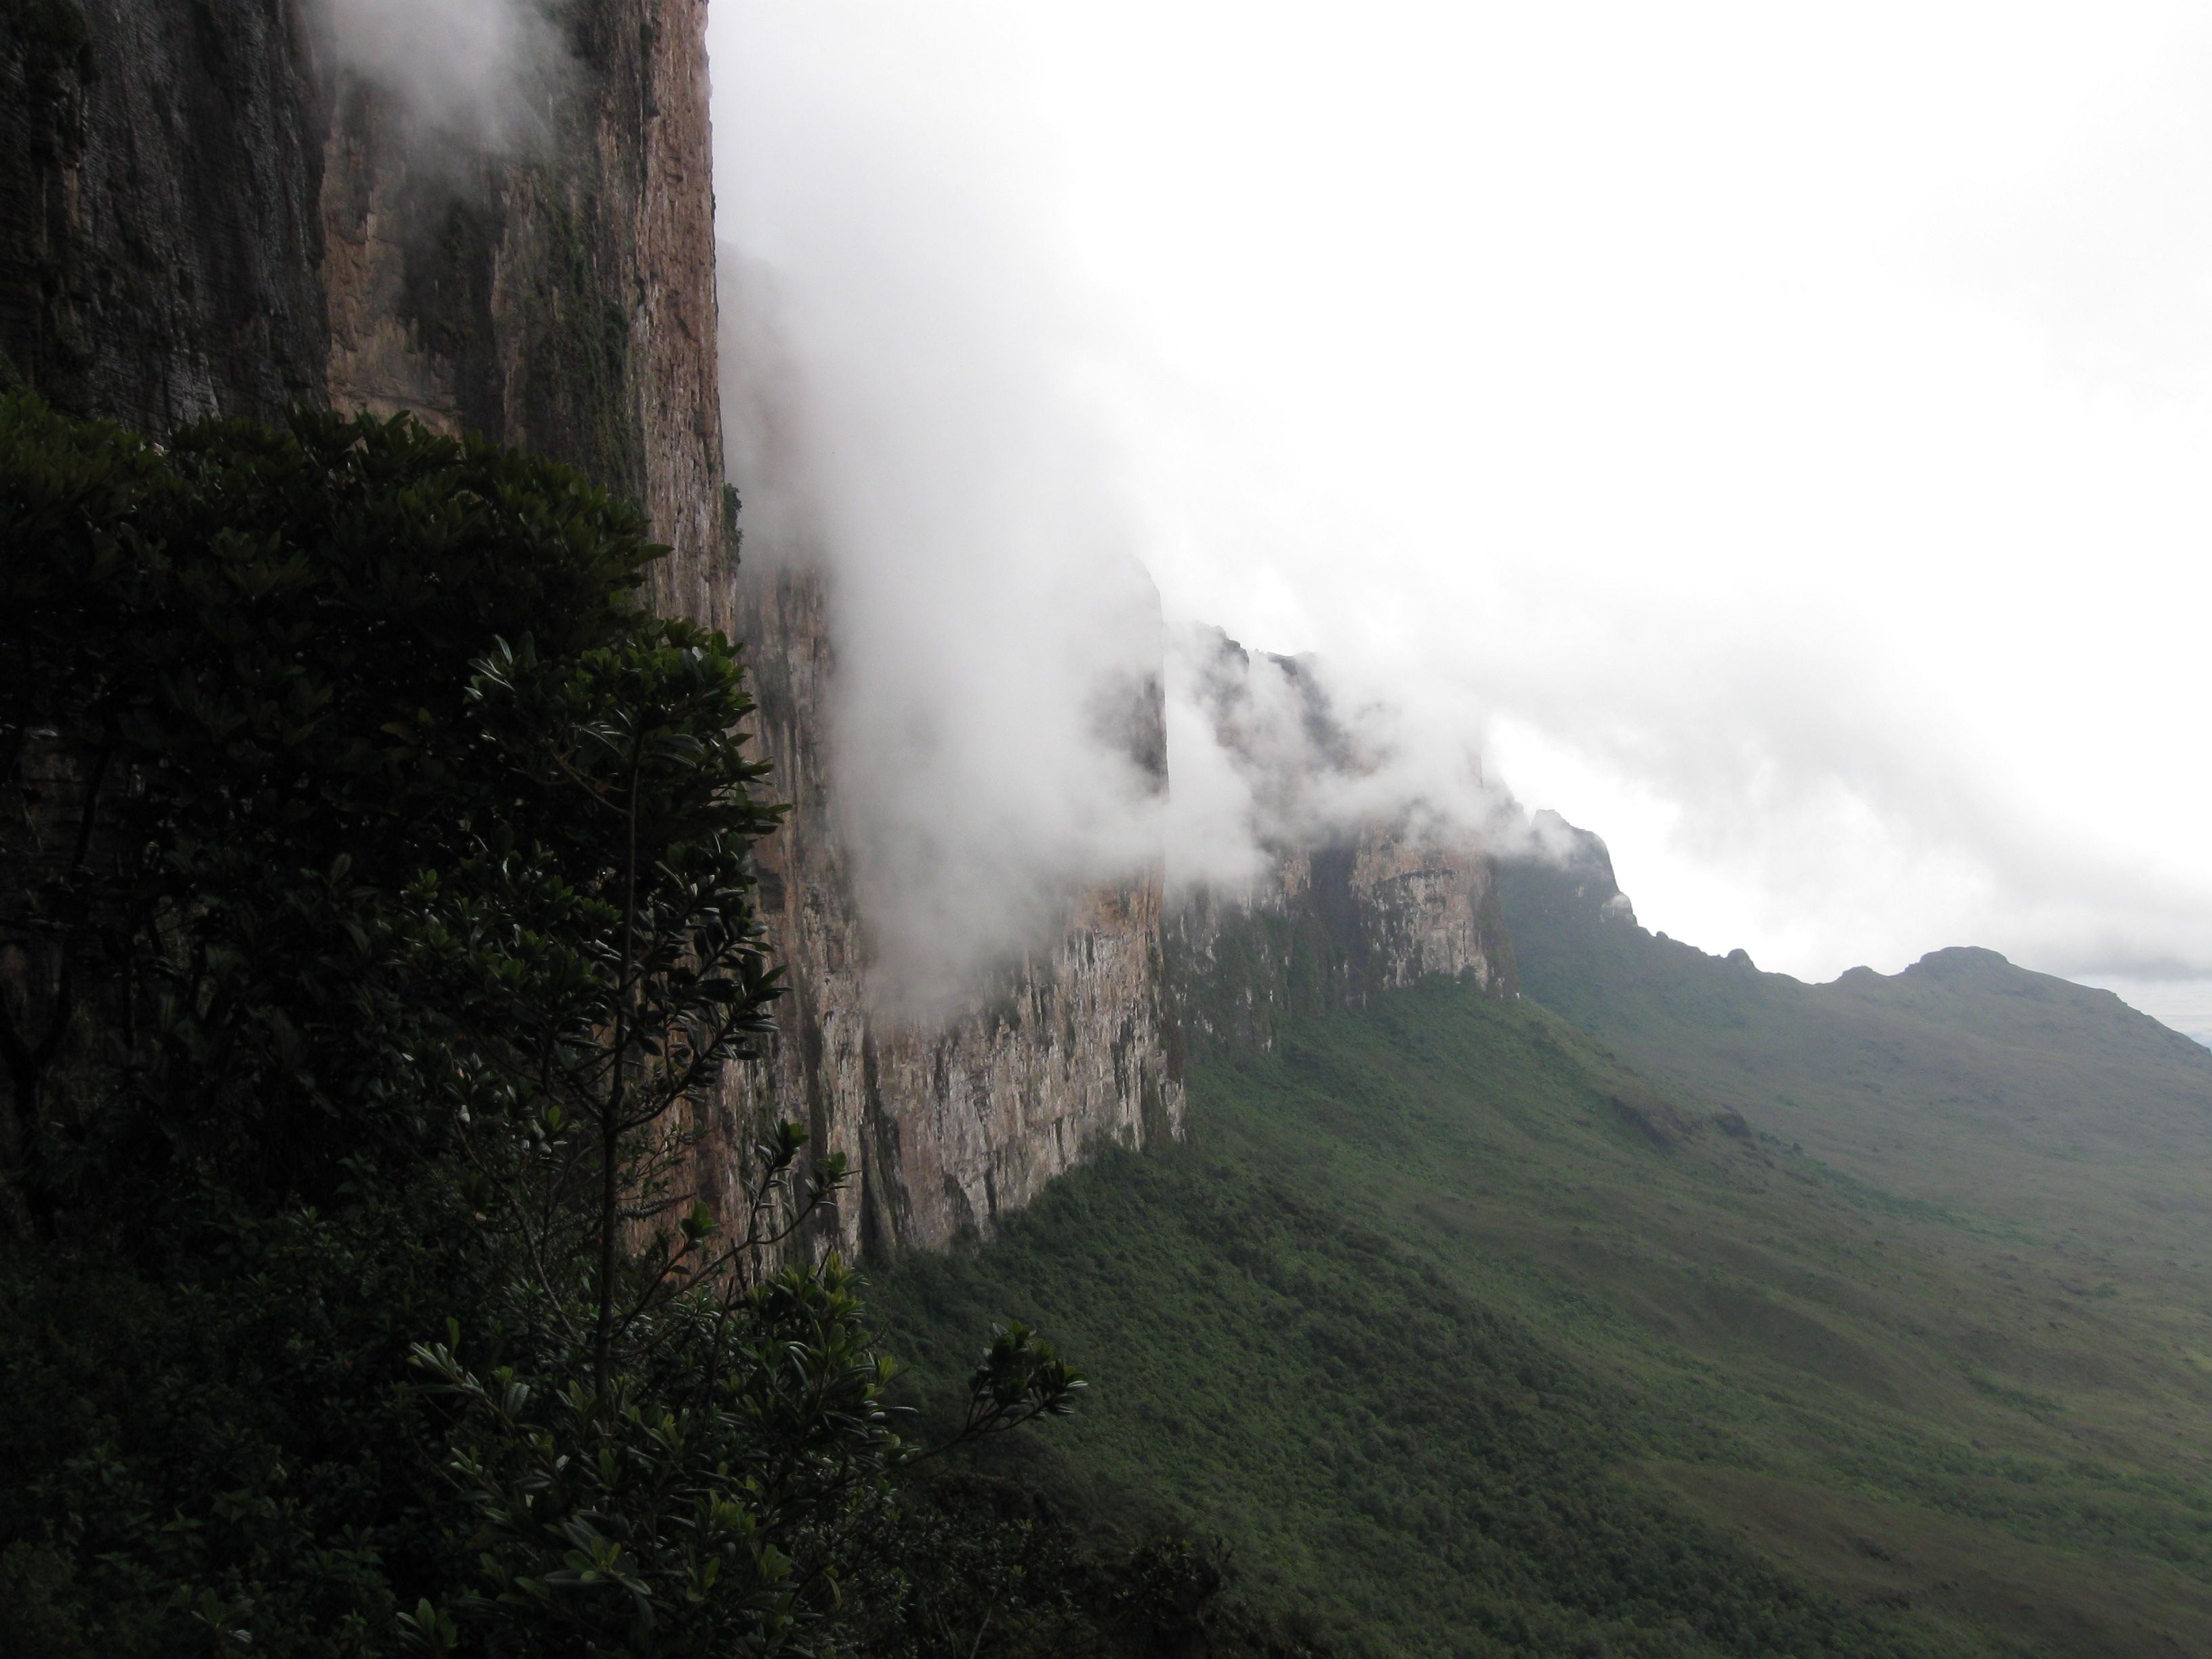 En ascenso a la cima del tepuyRoraima, Venezuela